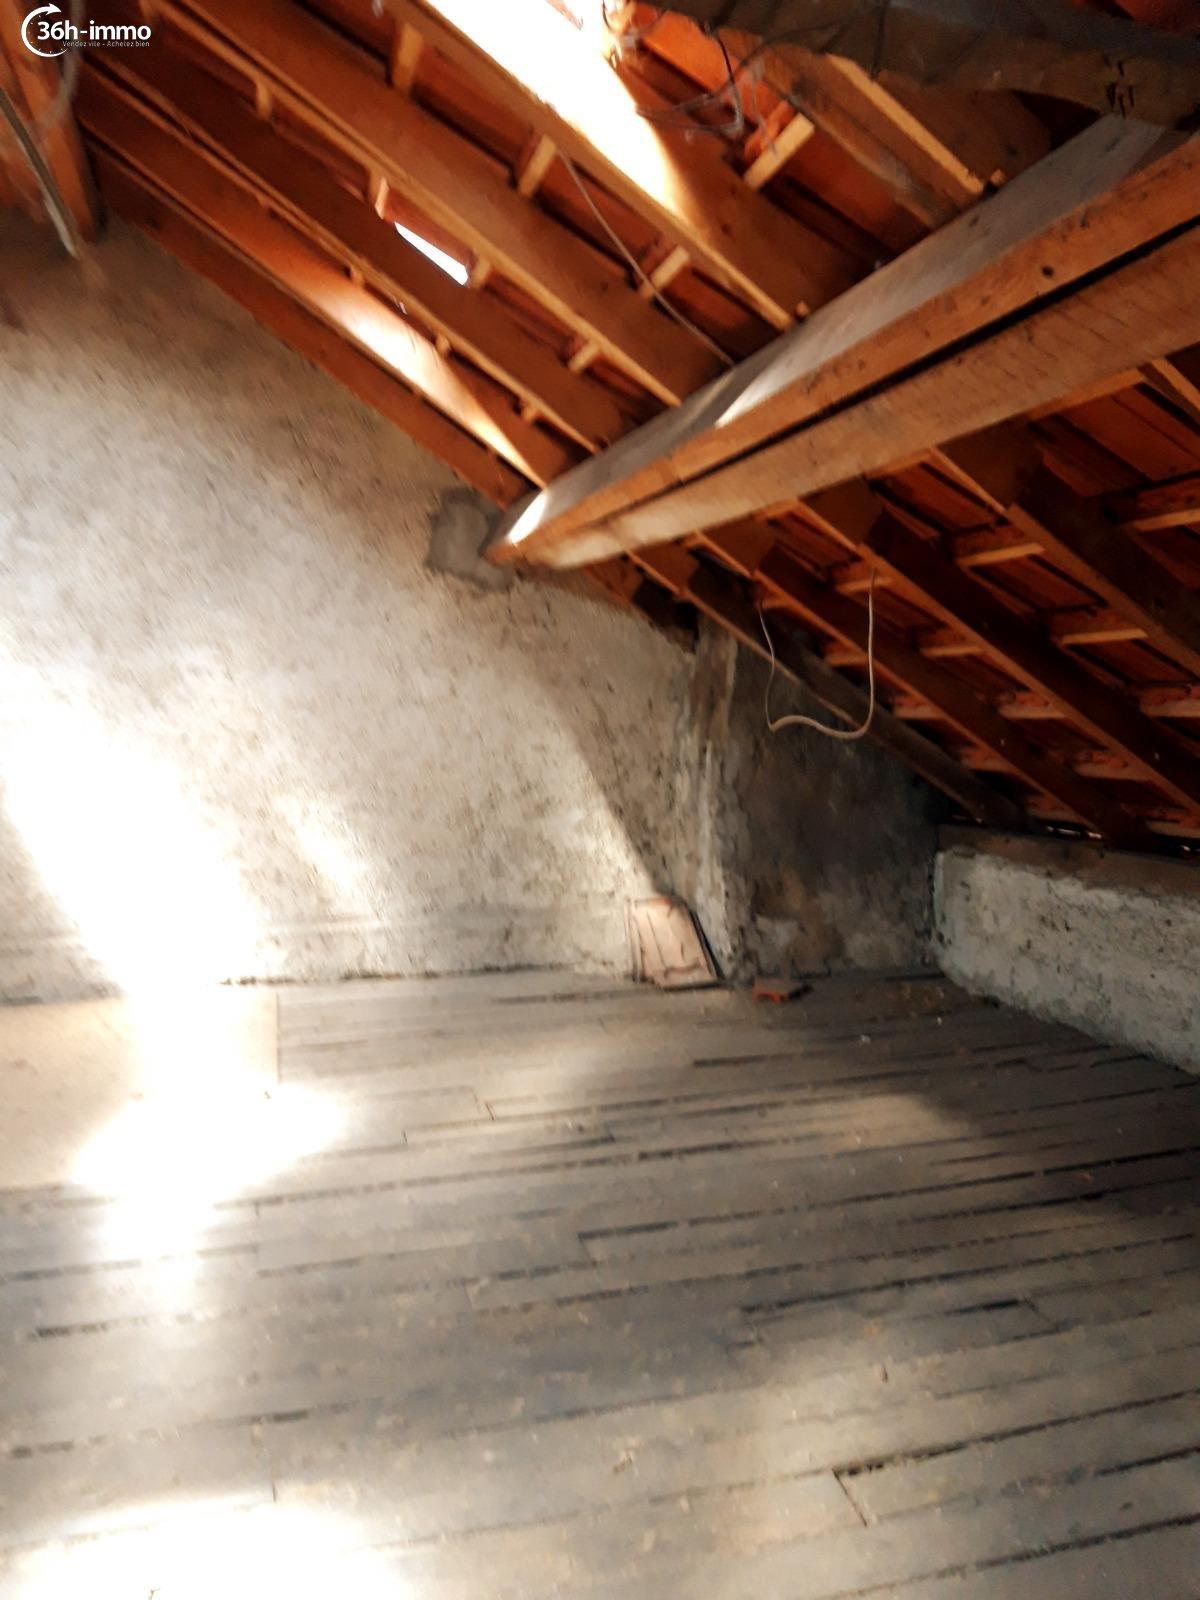 Maison Troyes 10000 Aube 68 m<sup>2</sup> 4 pi&eagrave;ces 110280 euros